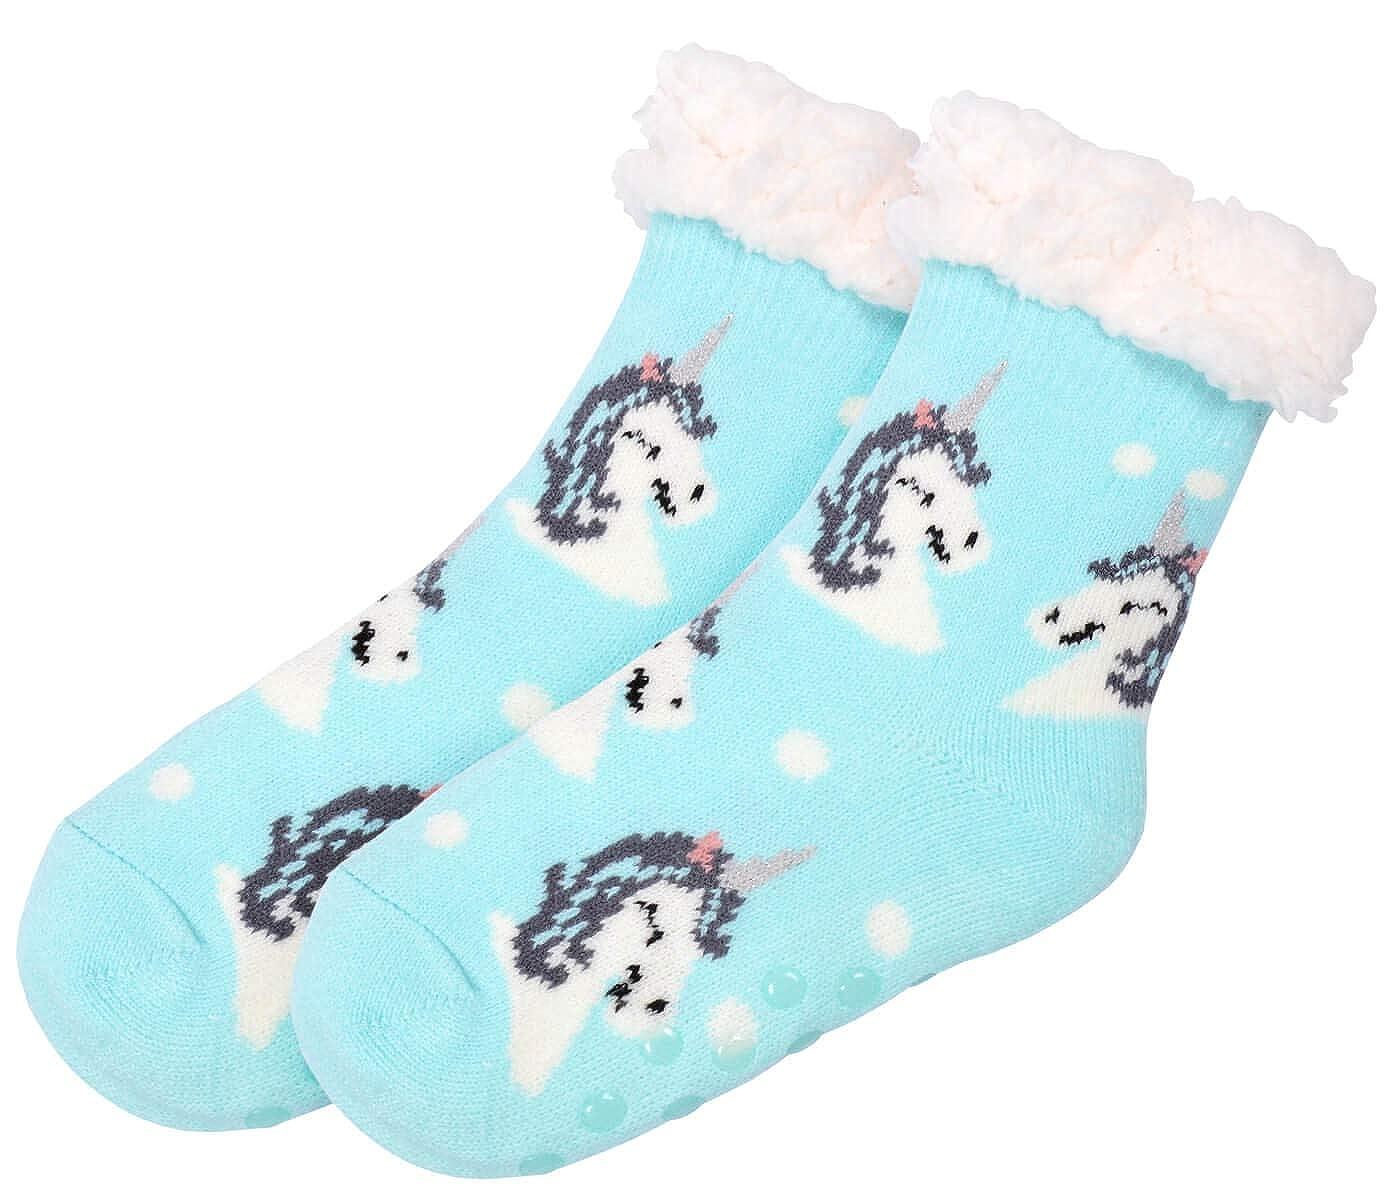 Cosy Indoor Slipper Socks One Size with Unicorn for Girls Children 8-12 Non Slip Grips Warm Fluffy Lining Super Soft Norwegian Style for Christmas Winter